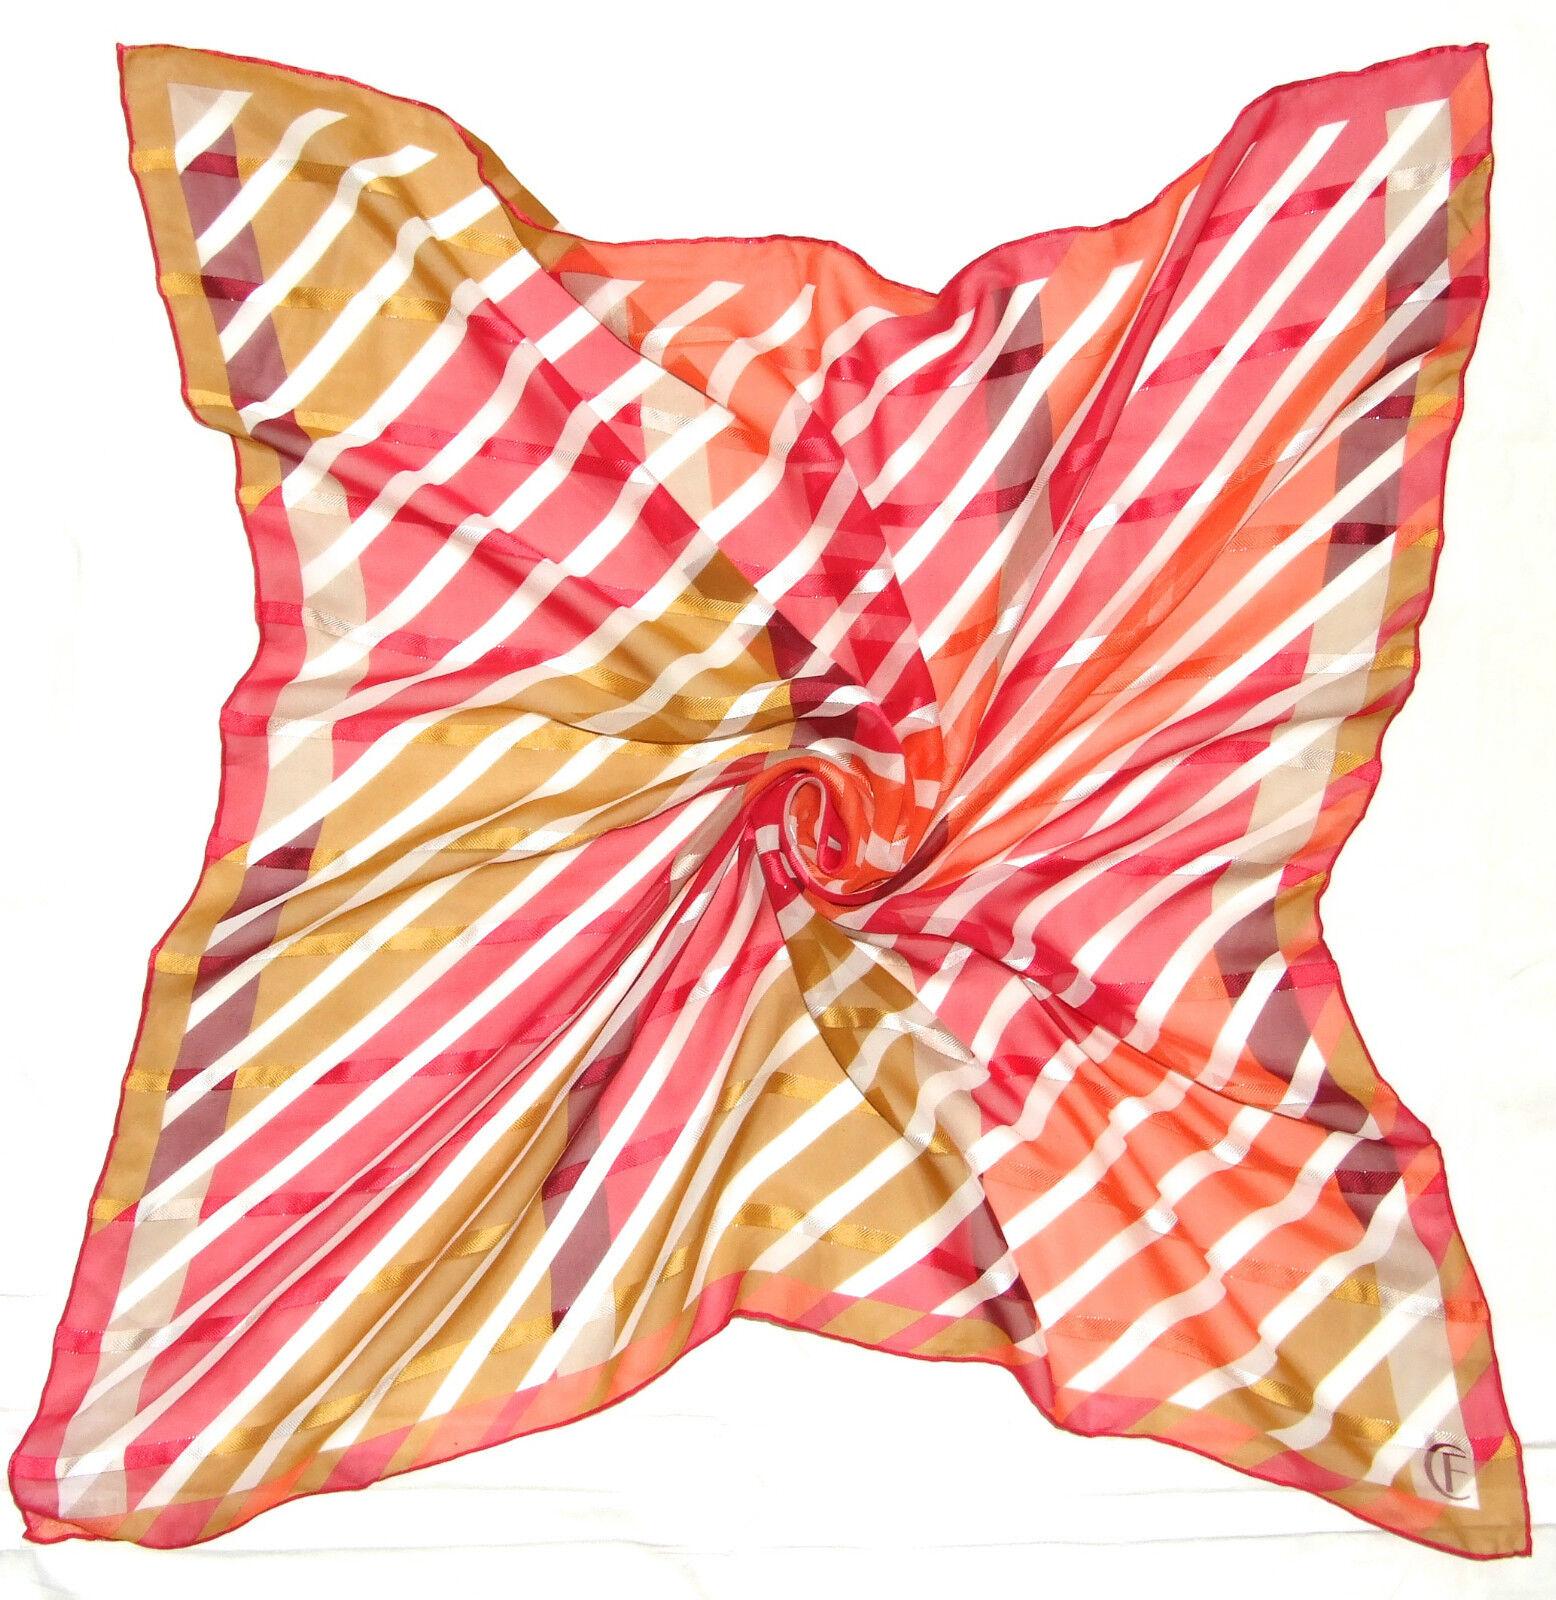 Amazing CHRISTIAN FISCHBACHER Signed GEOMETRIC Red Orange Chiffon Silk 31